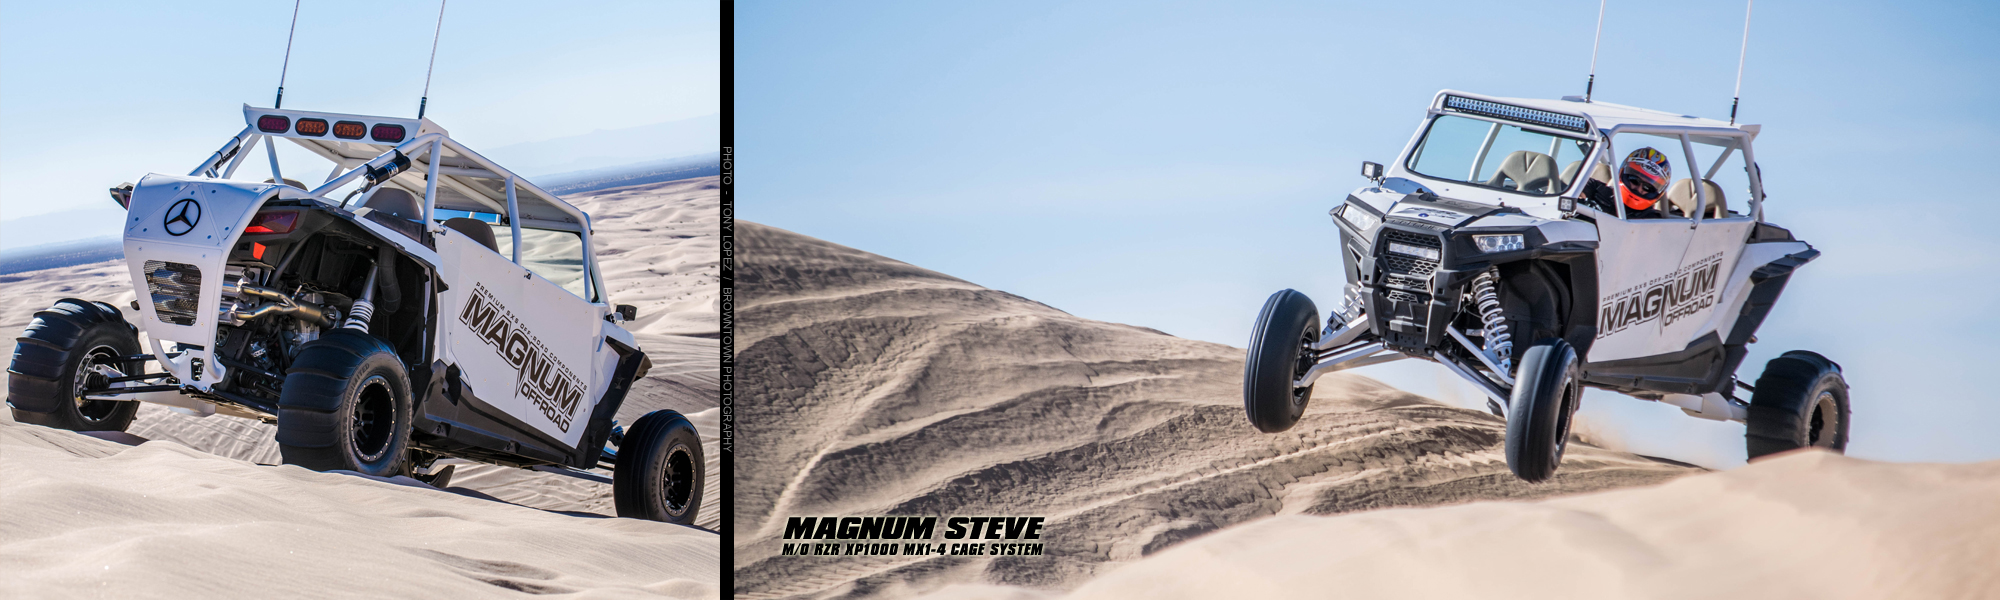 Magnum Offroad Polaris RZR XP 1000 MX1-4 Roll Cage System